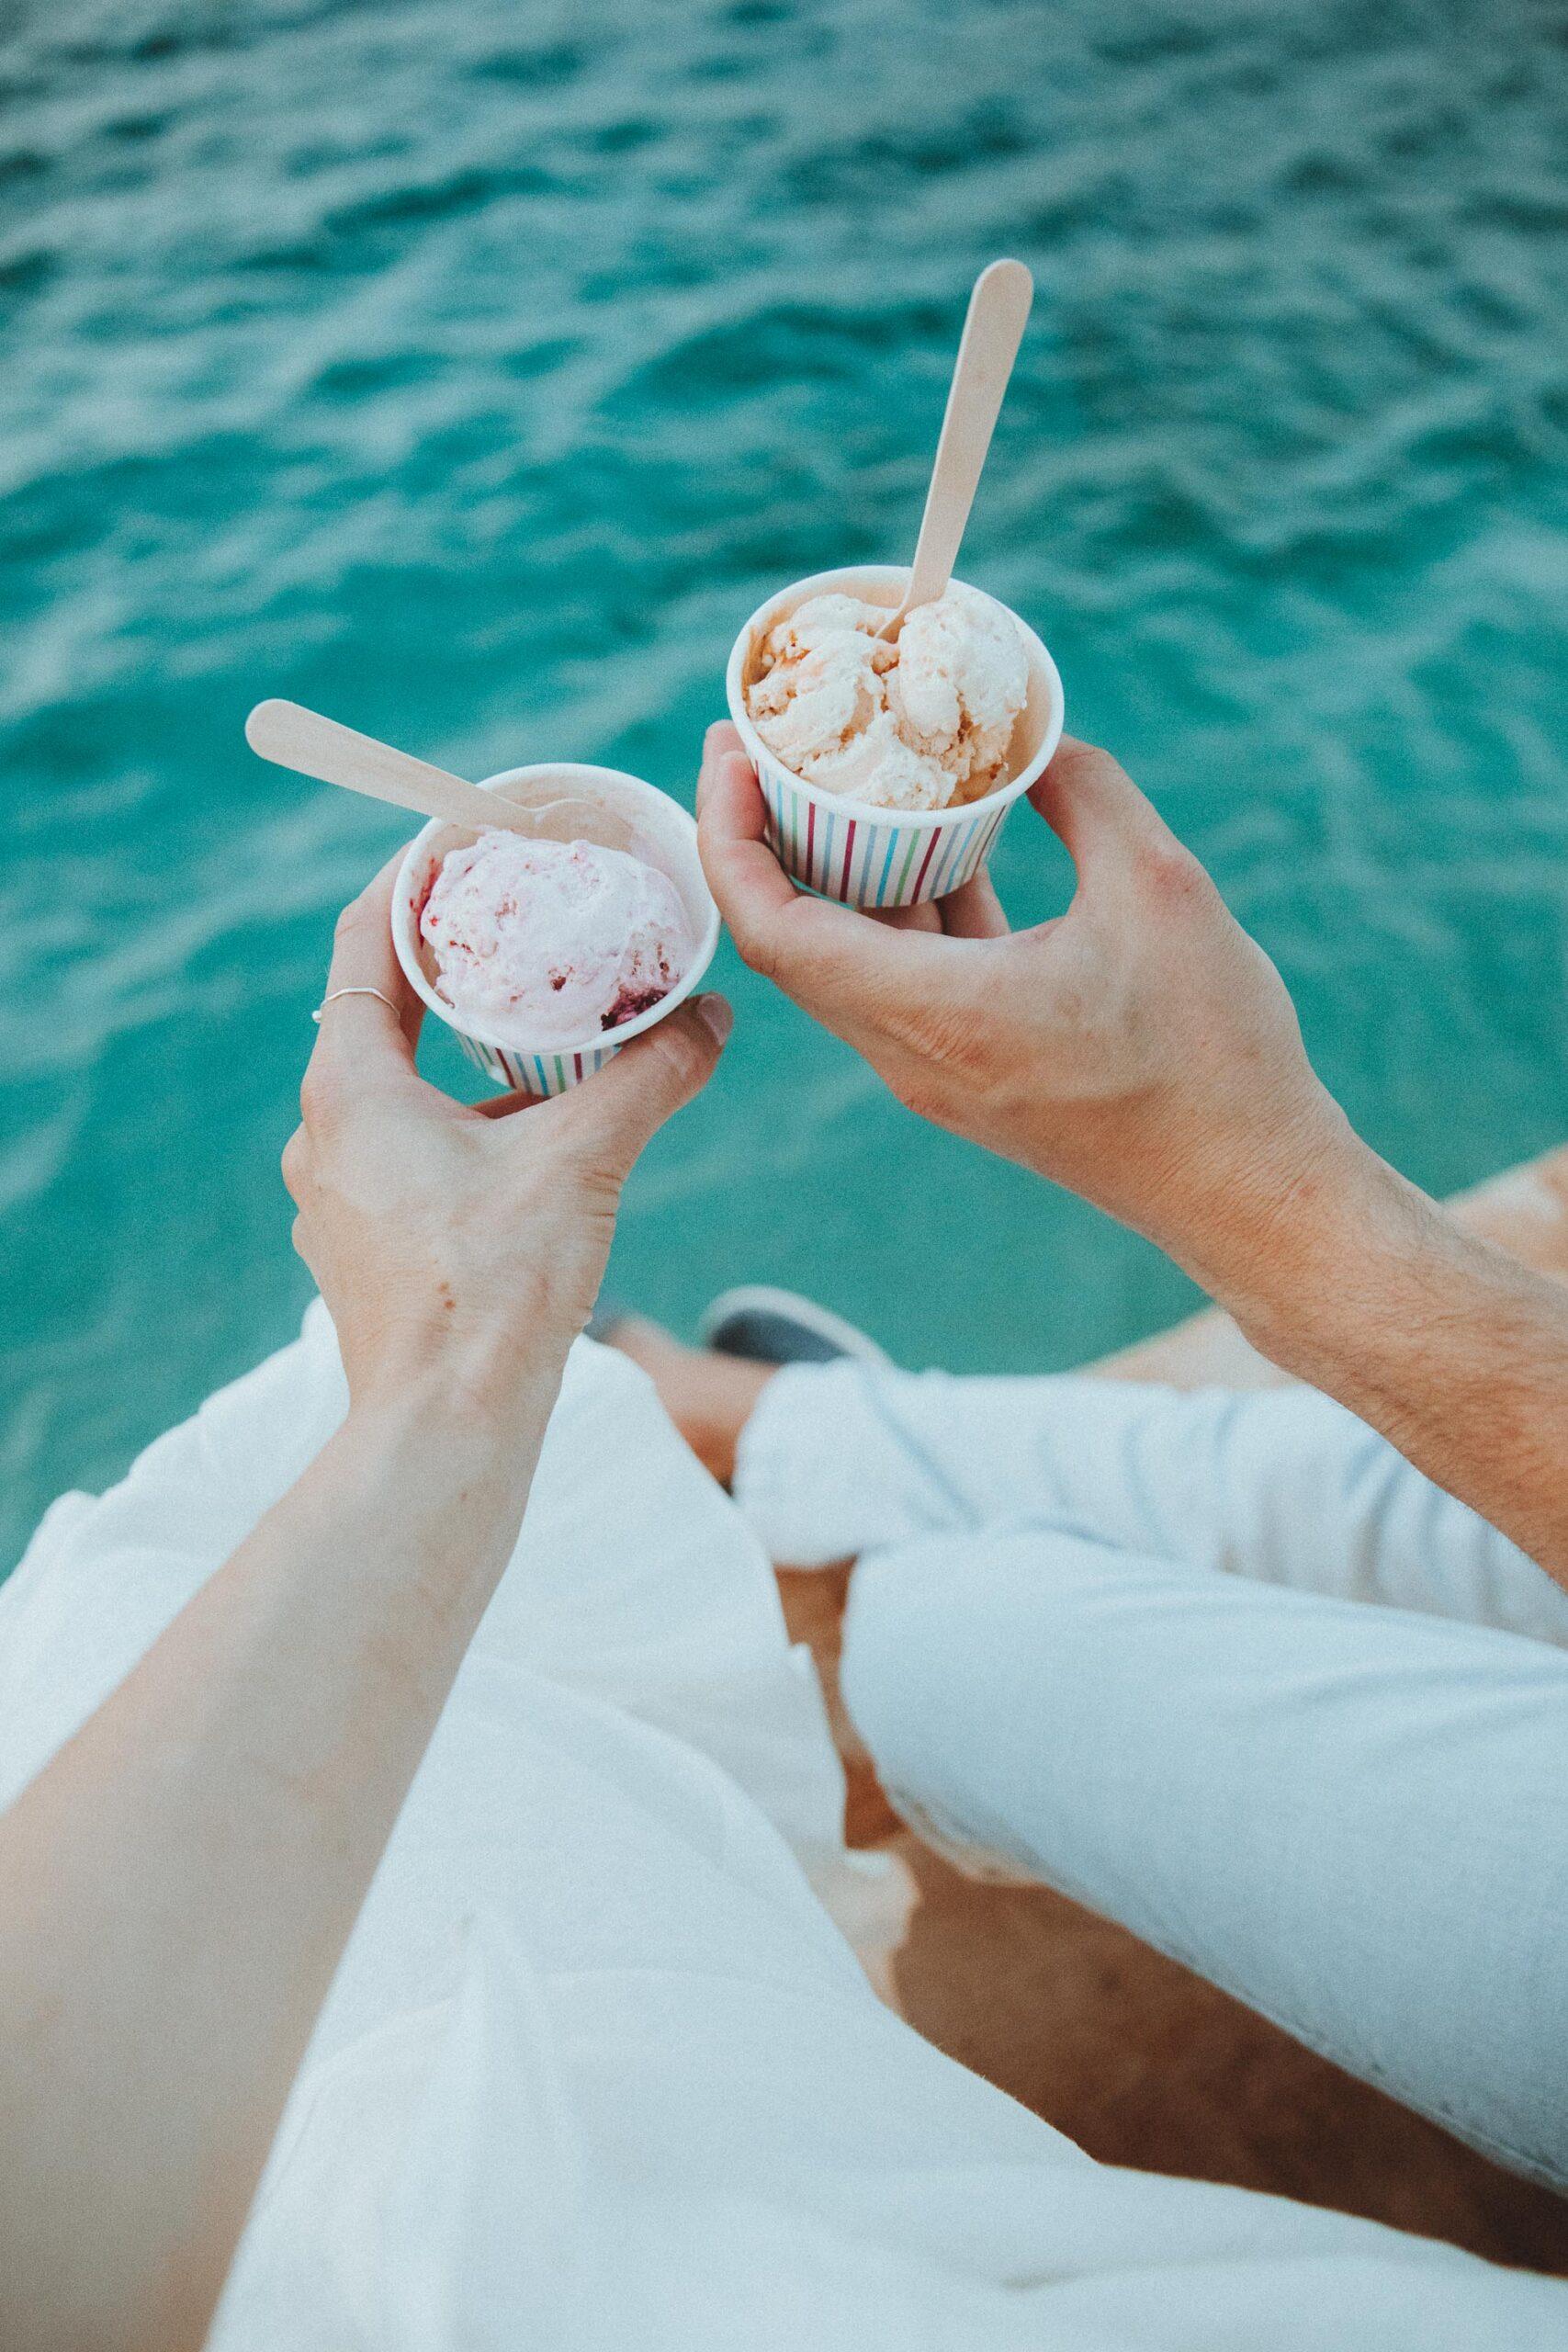 Homemade ice cream from Nobelos restaurant in Zakynthos Greece